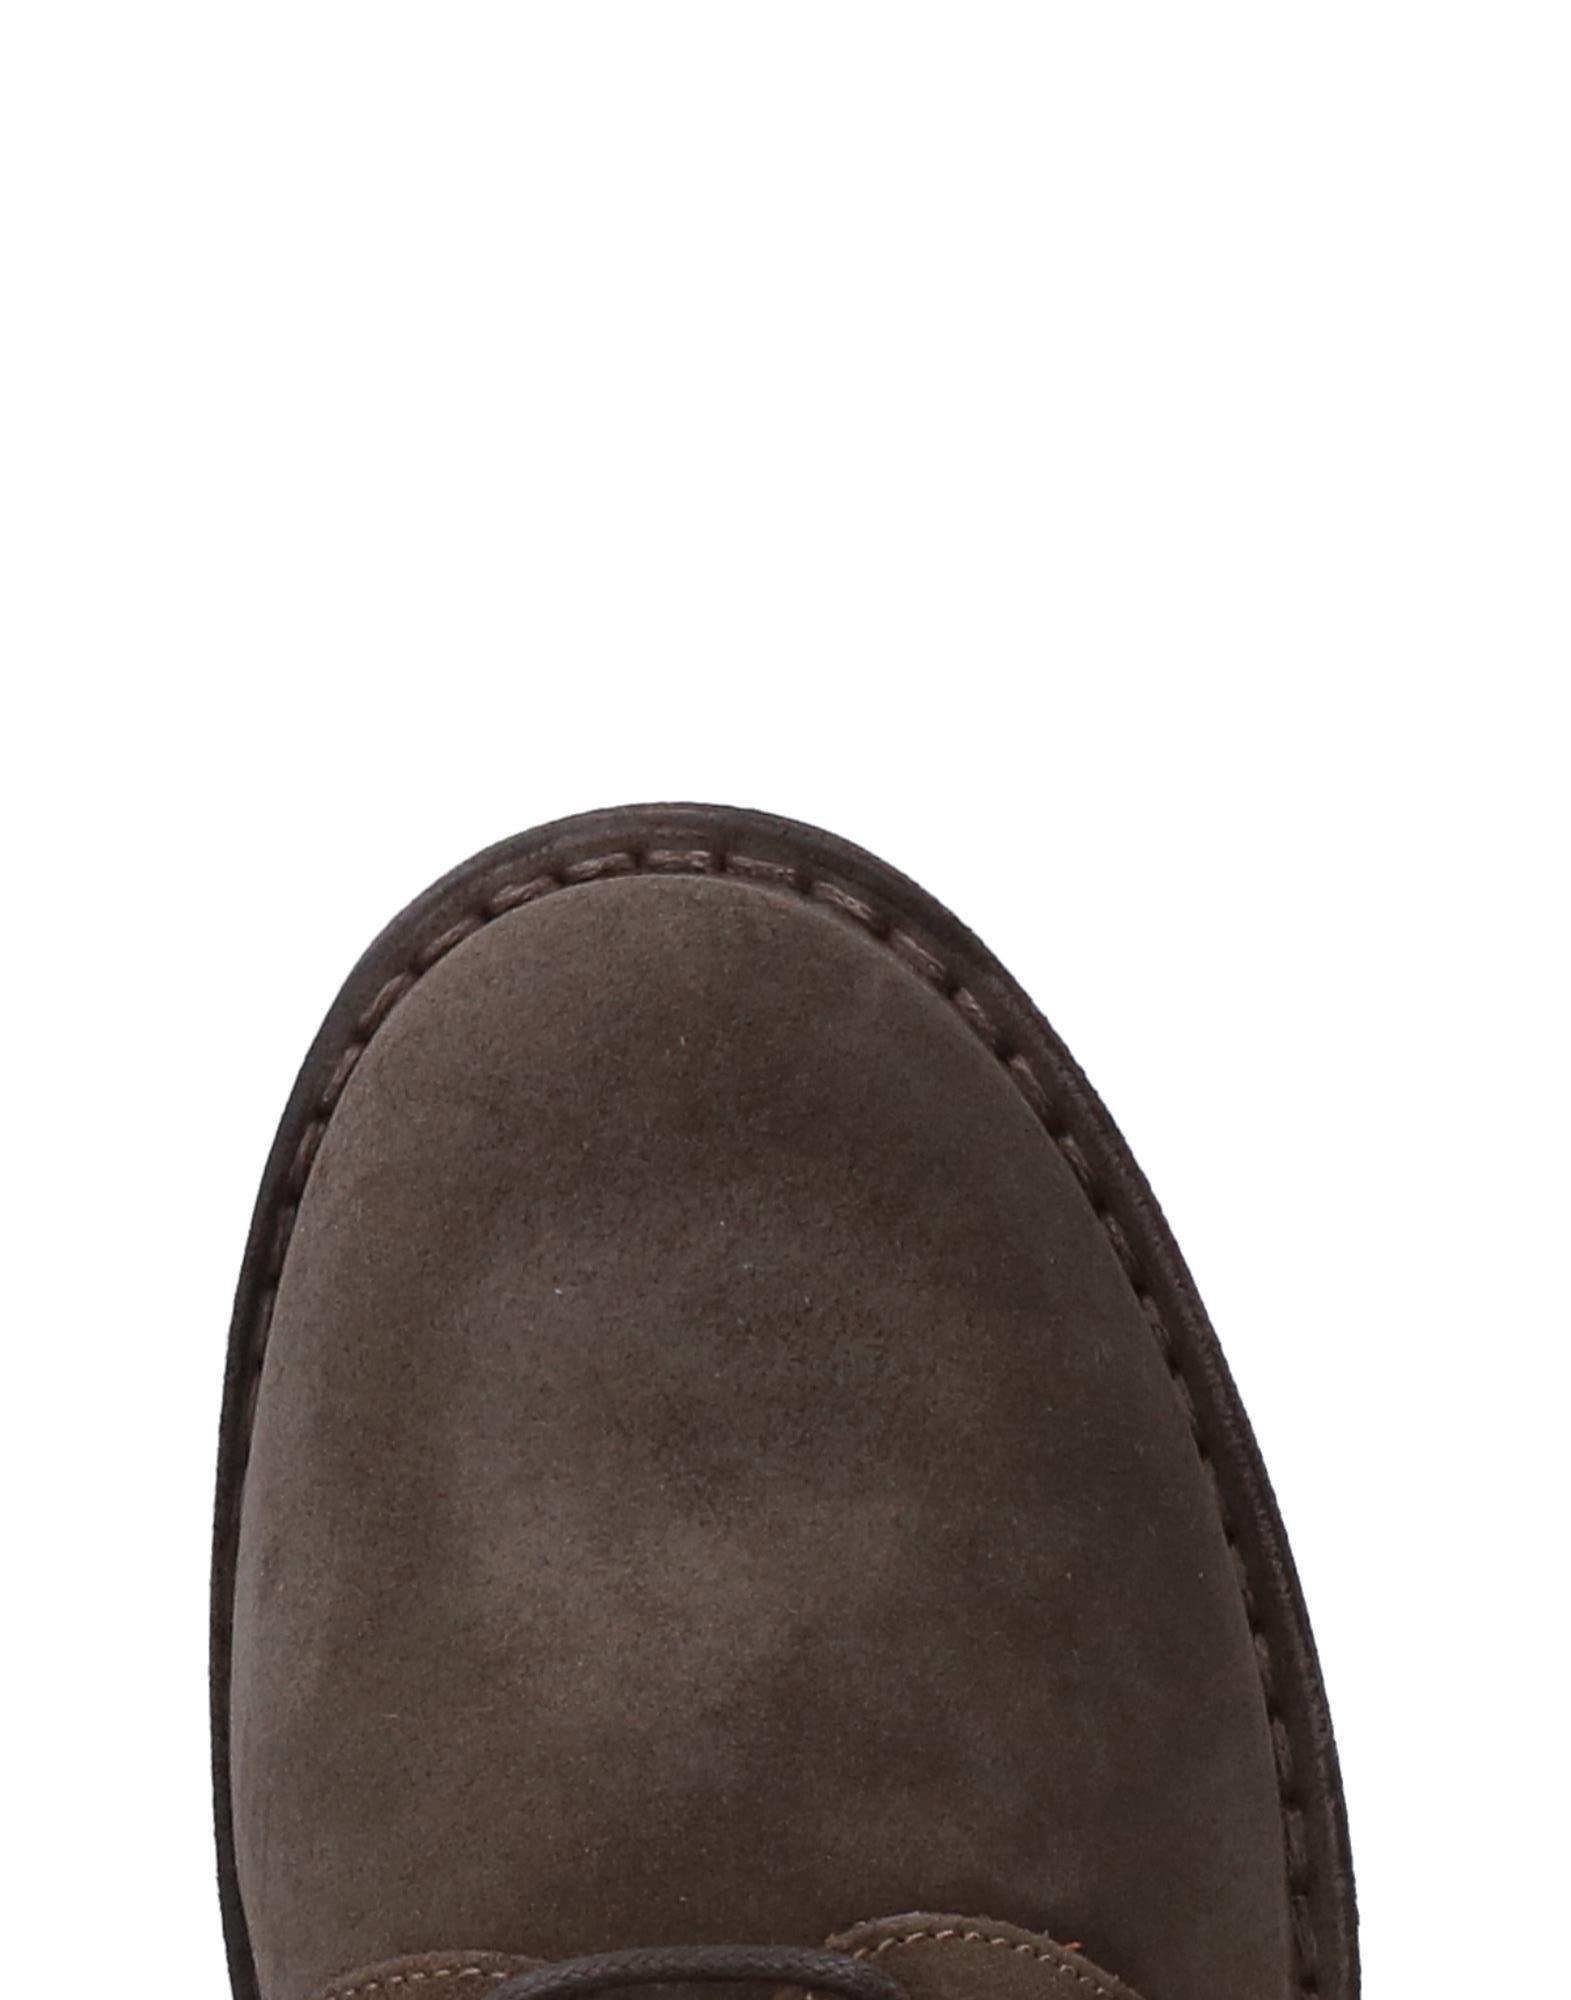 Fiorentini+Baker aussehende Schnürschuhe Damen  11316053NSGut aussehende Fiorentini+Baker strapazierfähige Schuhe 6c60ed